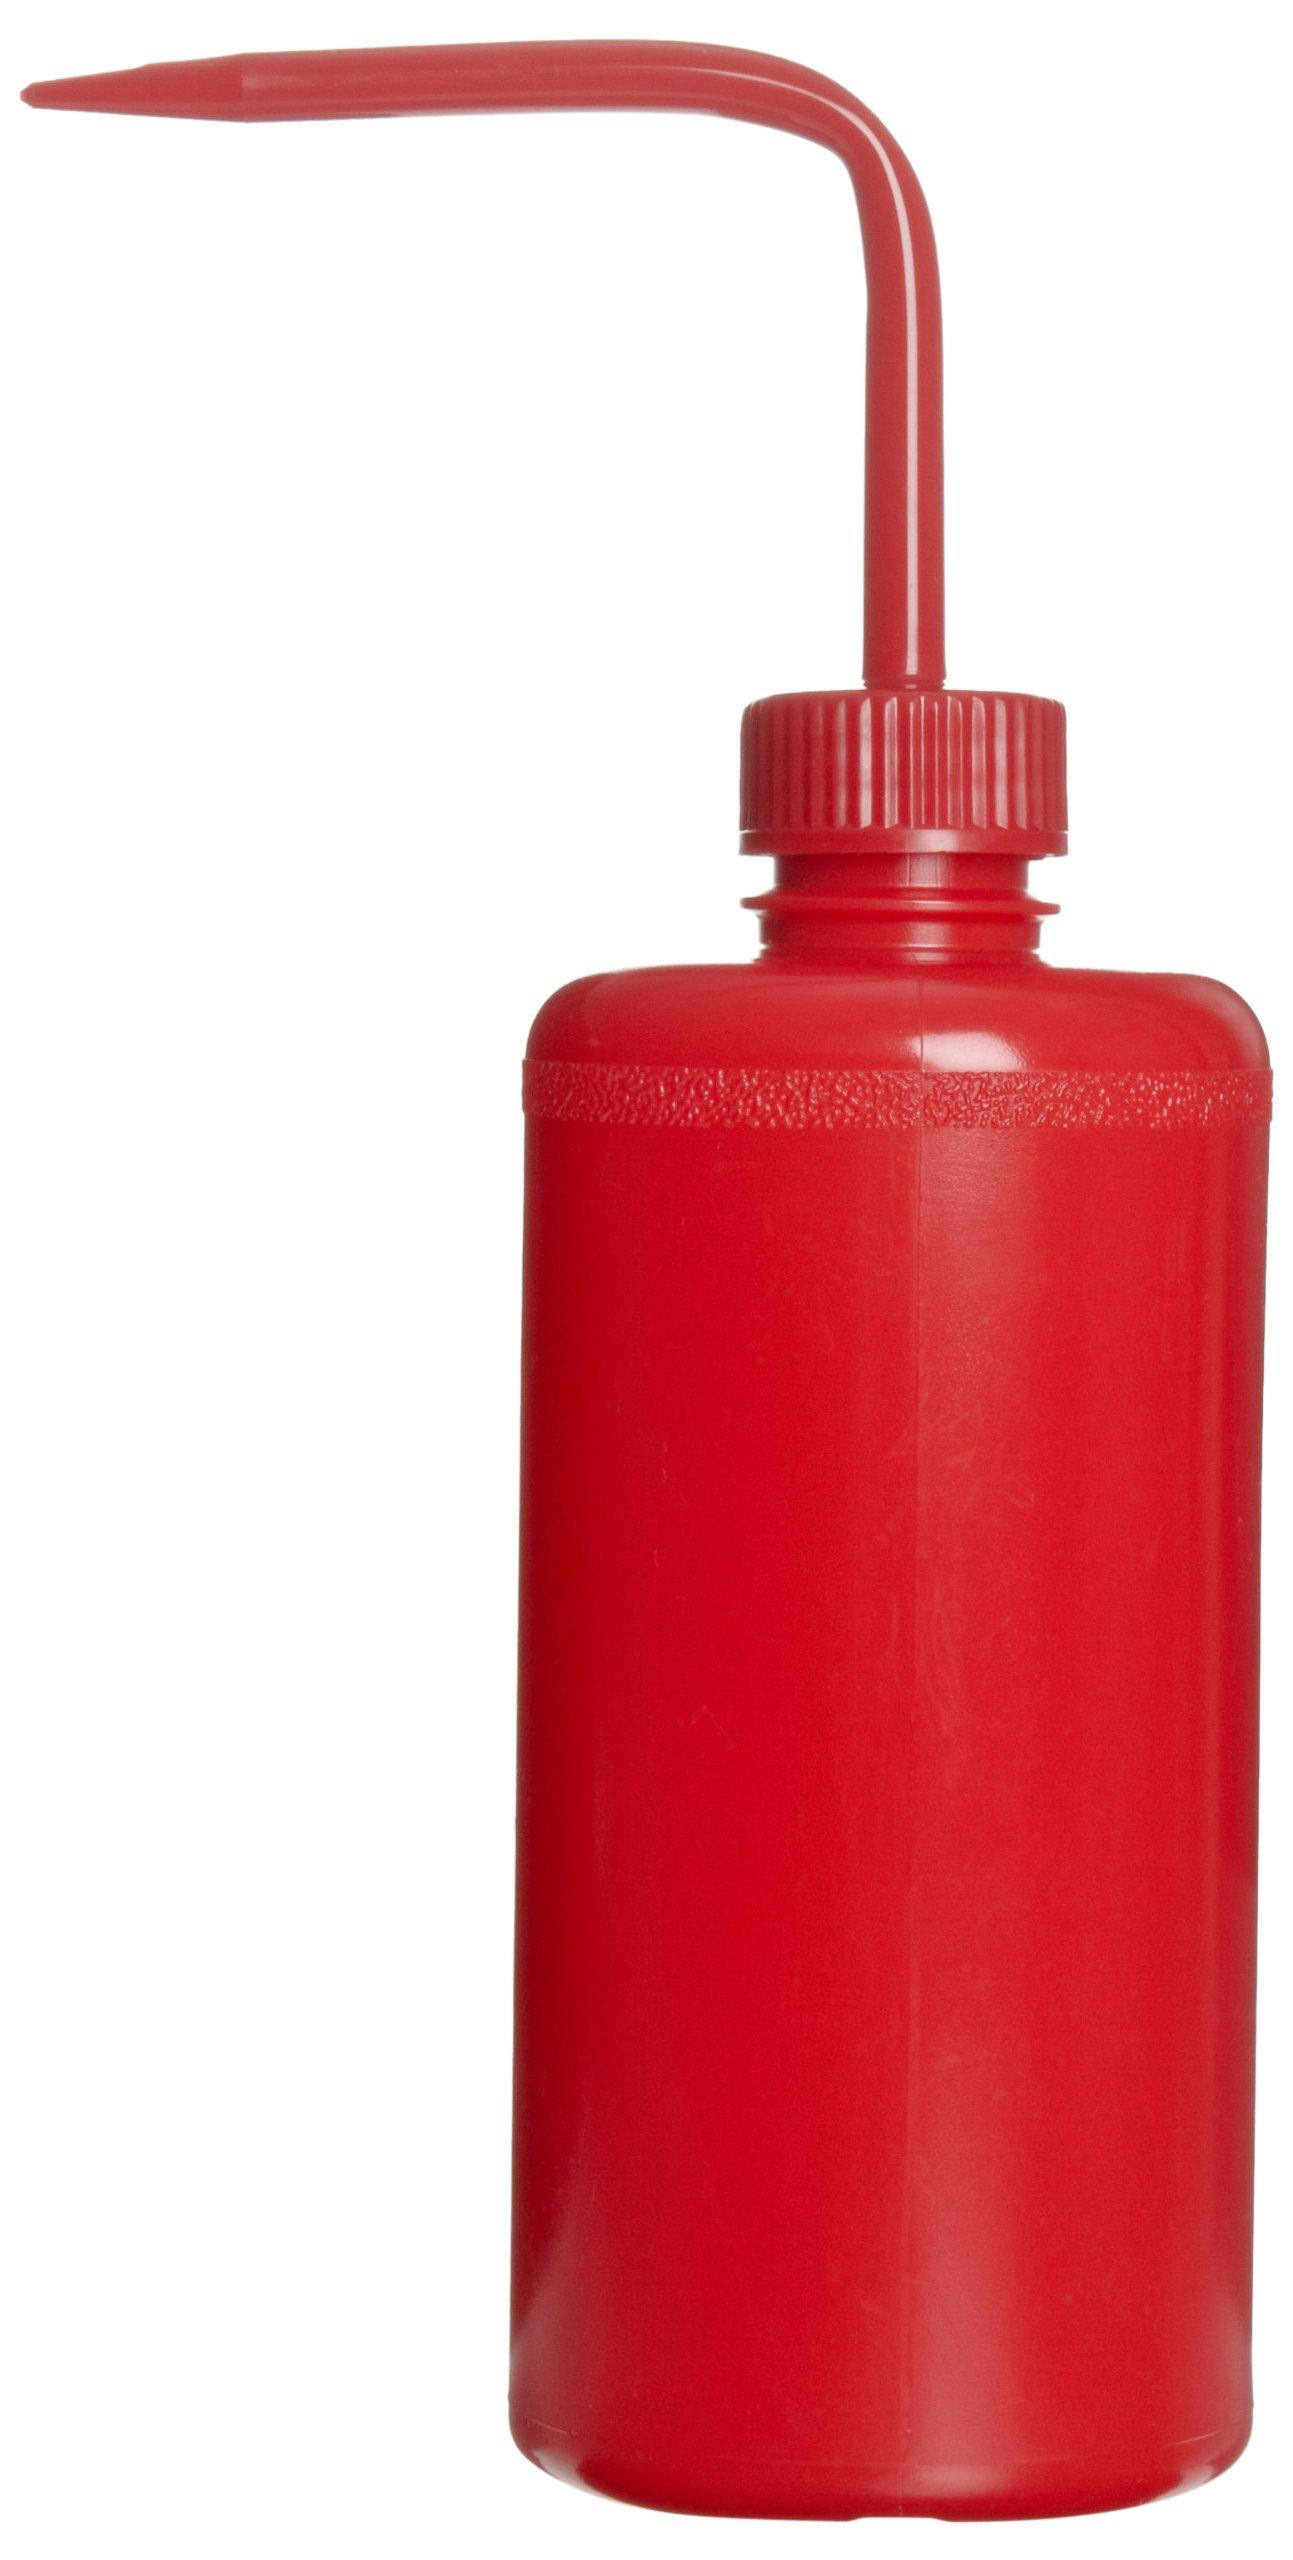 Bel-Art Red 500ml (16oz) Polyethylene Wash Bottles; Polypropylene Cap, 28mm Closure (Pack of 6) (F11650-0016)